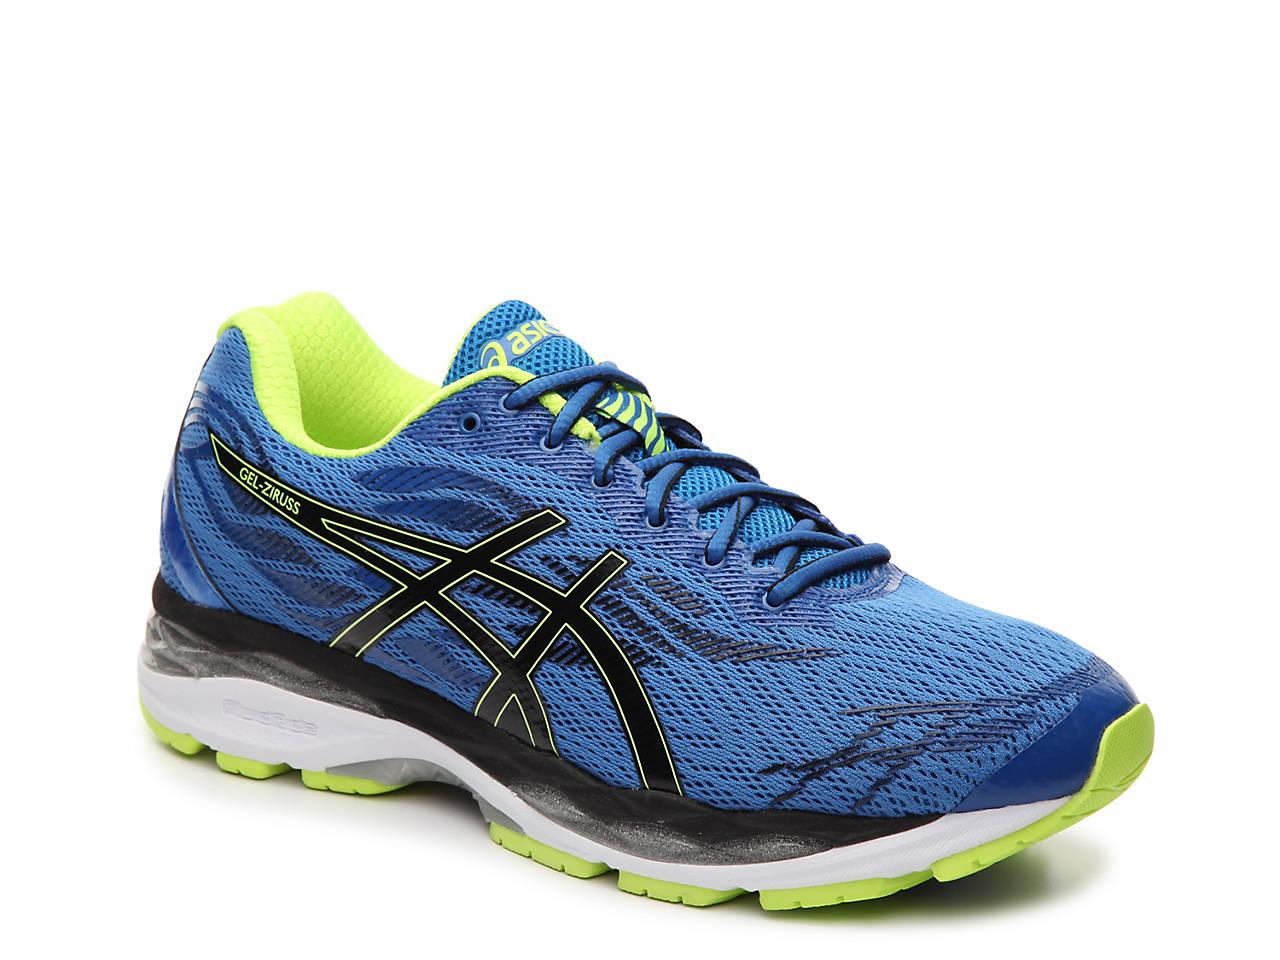 Garantie de satisfaction à 100% choisir véritable qualité parfaite GEL-Ziruss Running Shoe - Men's